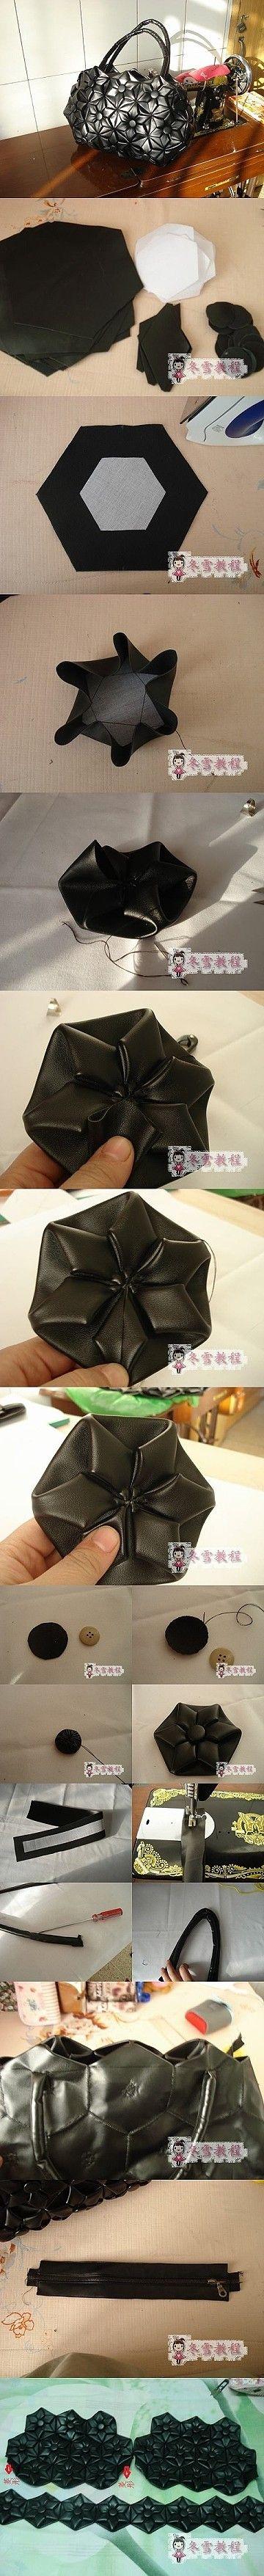 Fold origami patchwork bag